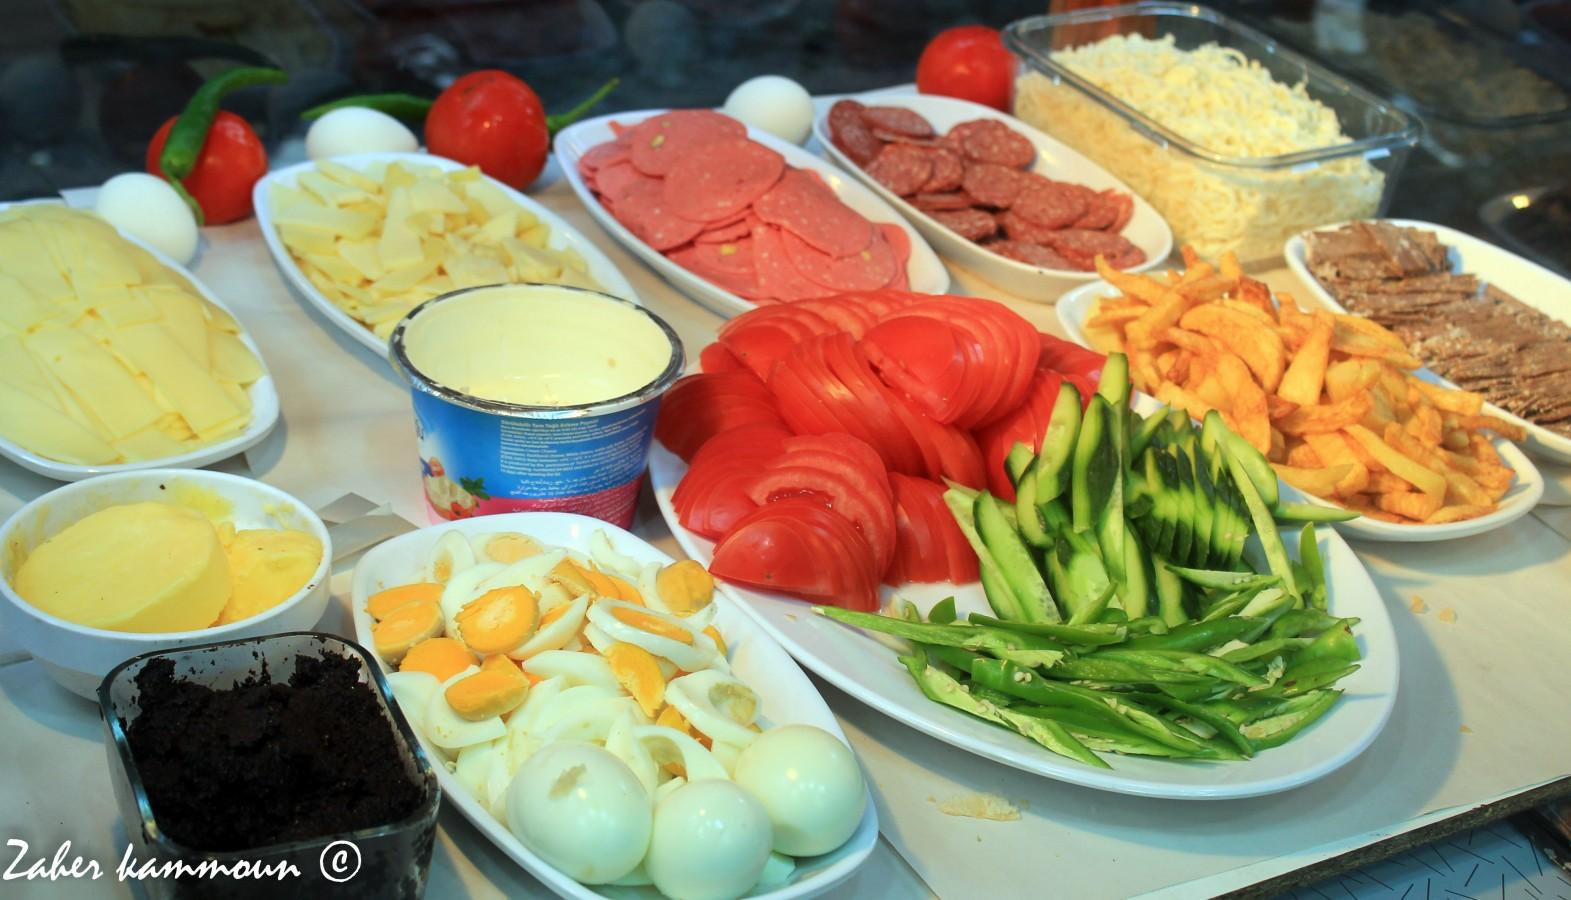 Zaher kammoun la cuisine turque - Cuisine turc traditionnel ...